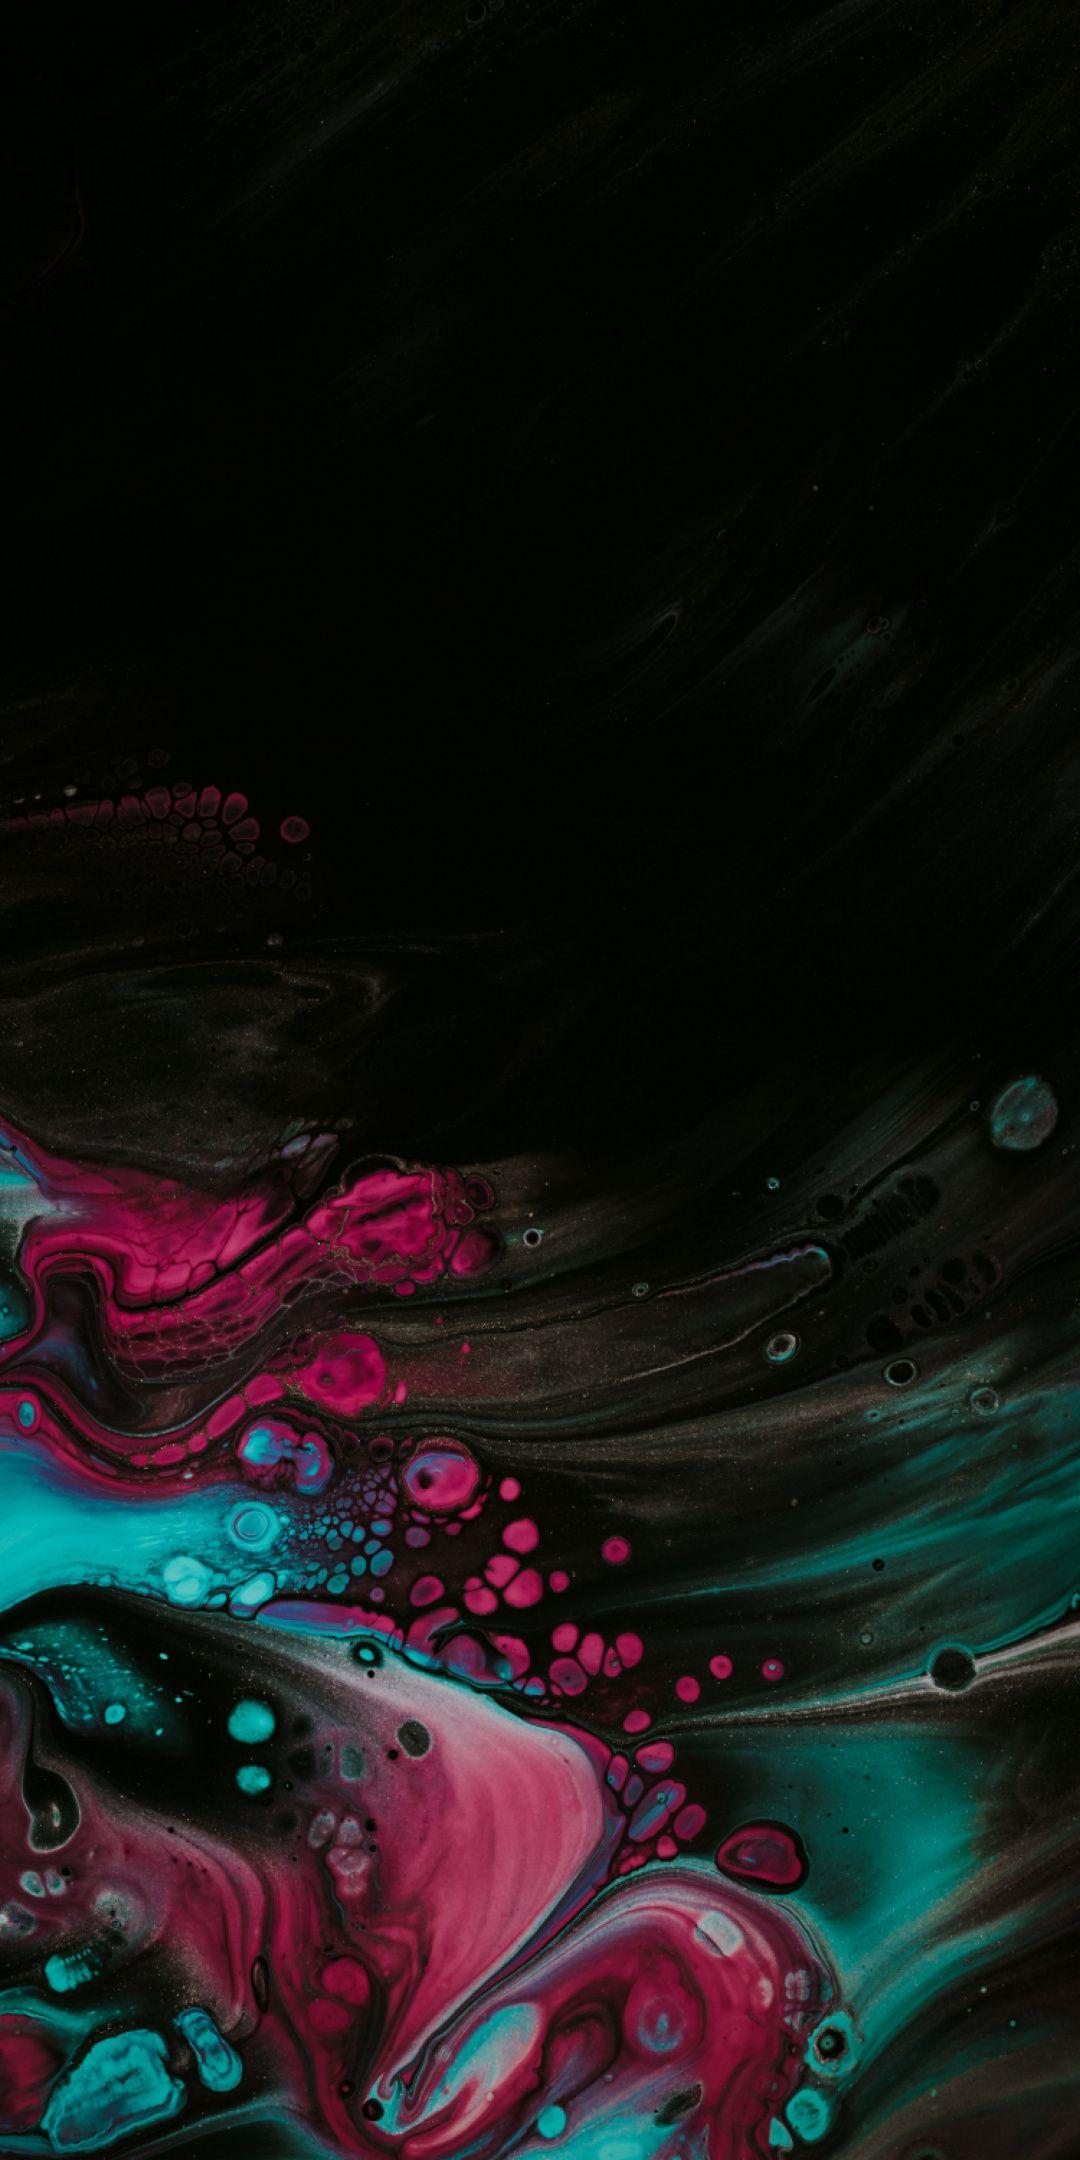 Neon Texture Abstract Dark Art 1080x2160 Wallpaper Wallpaper Iphone Neon Phone Wallpaper Images Neon Wallpaper